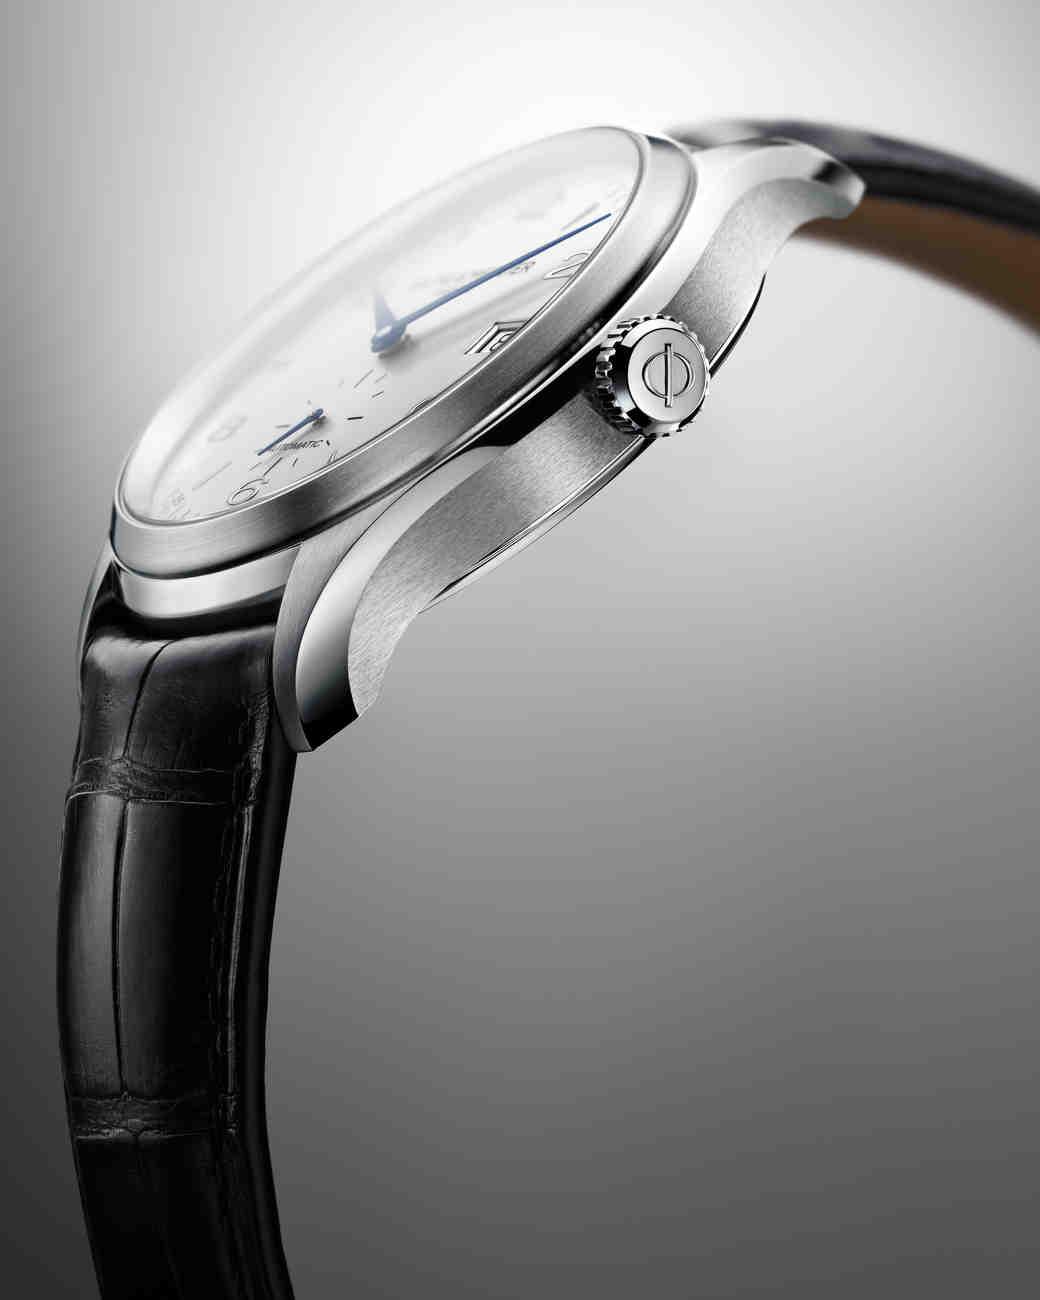 baume-mercier-watch-watch-care-3-0514.jpg